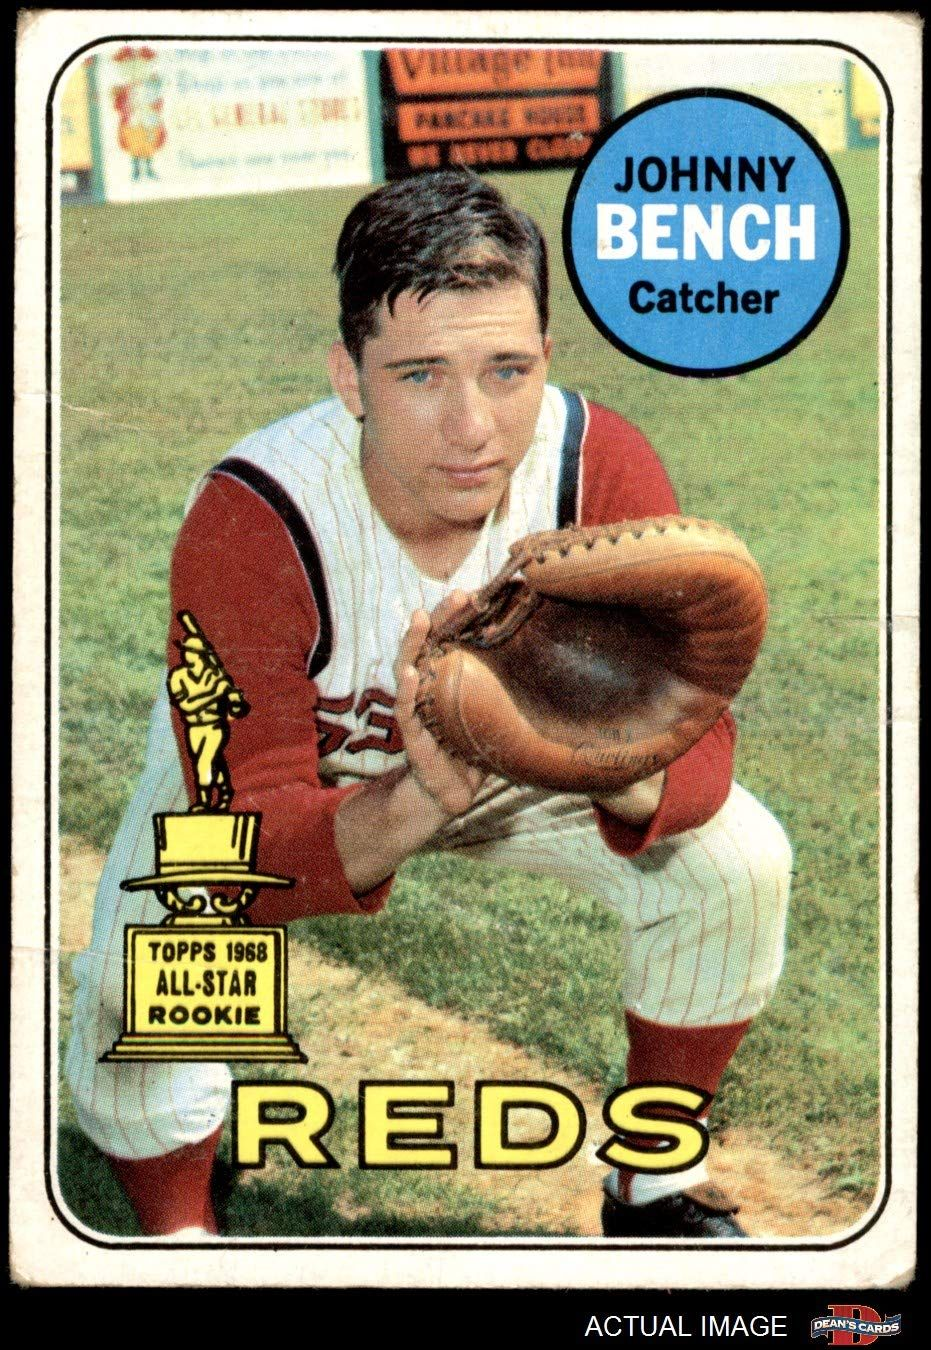 1969 topps 95 johnny bench cincinnati reds baseball card